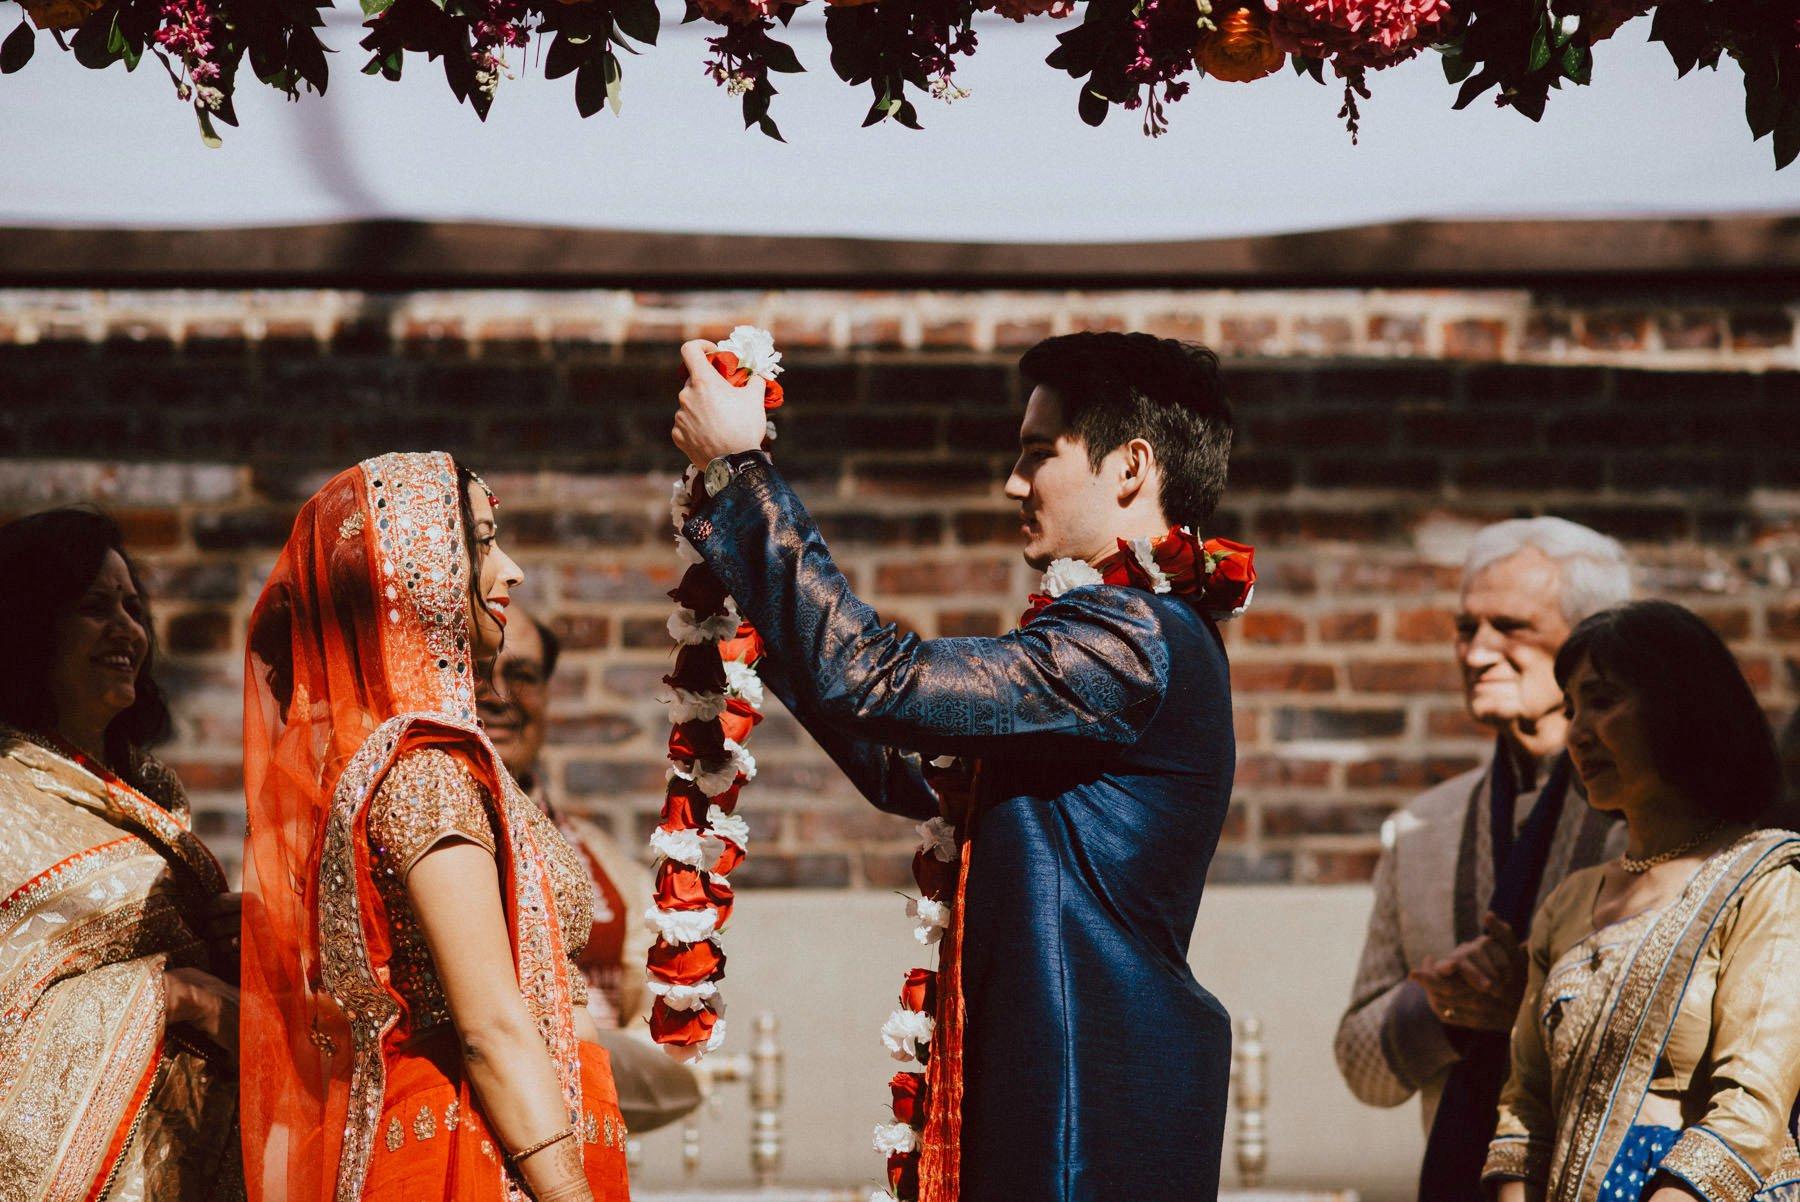 vie-philadelphia-indian-wedding-78.jpg